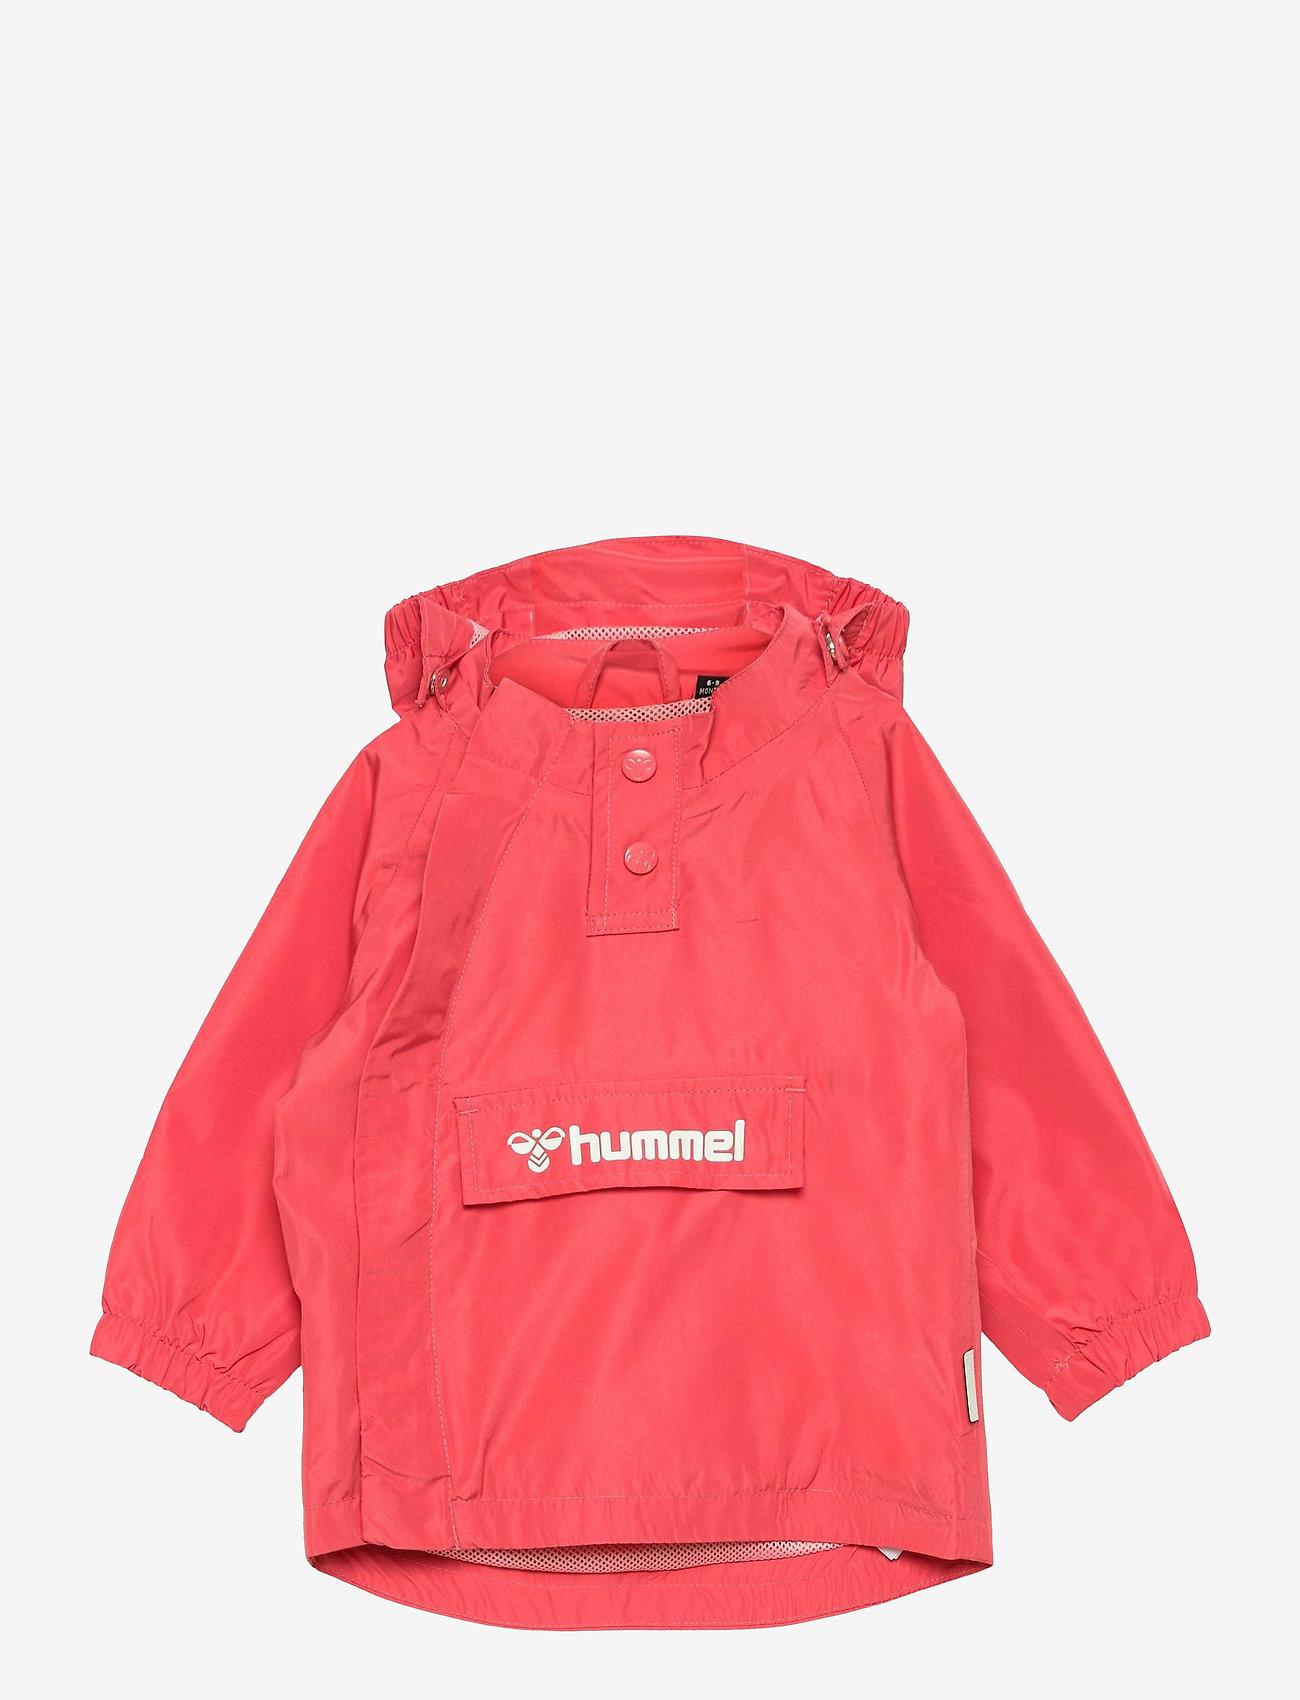 Hummel - hmlOJO JACKET - light jackets - tea rose - 0